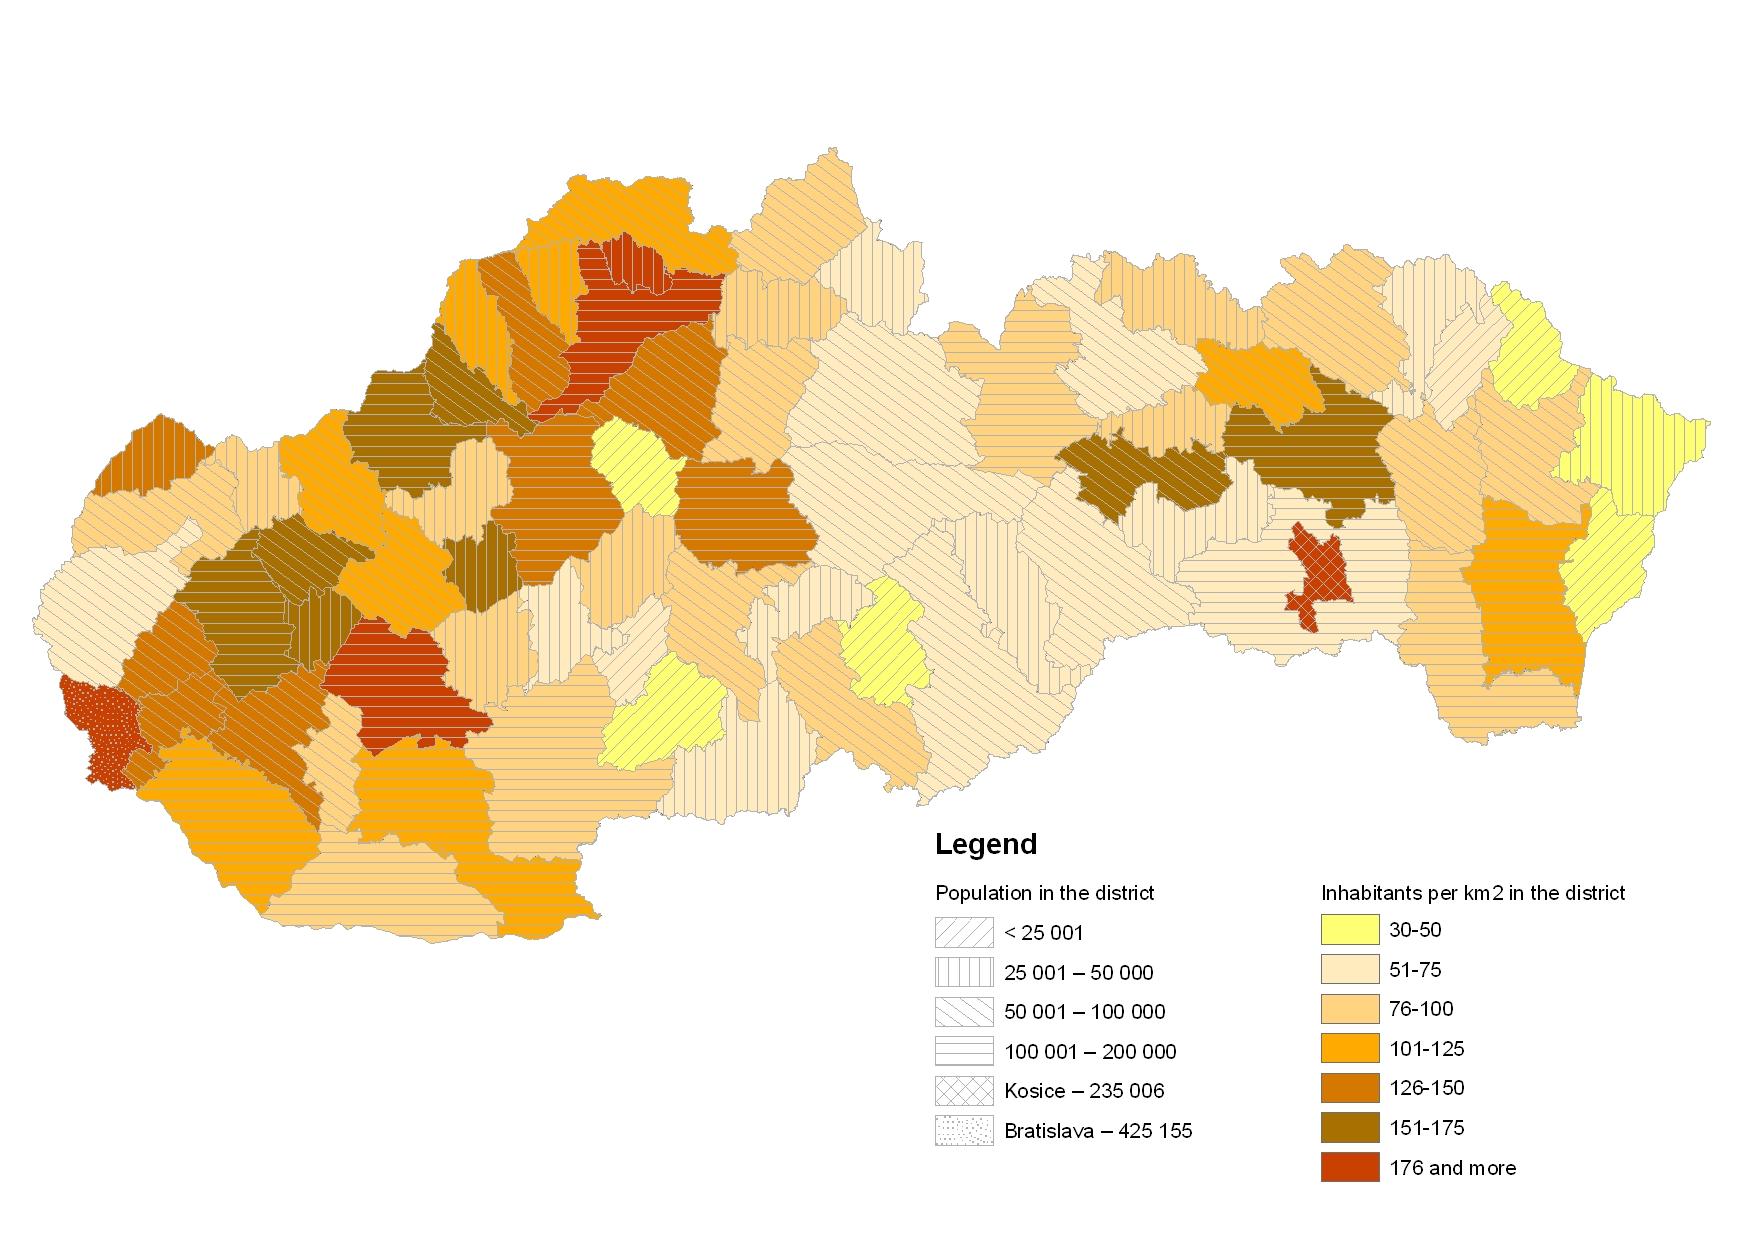 Figure 1 - Population in Slovakia